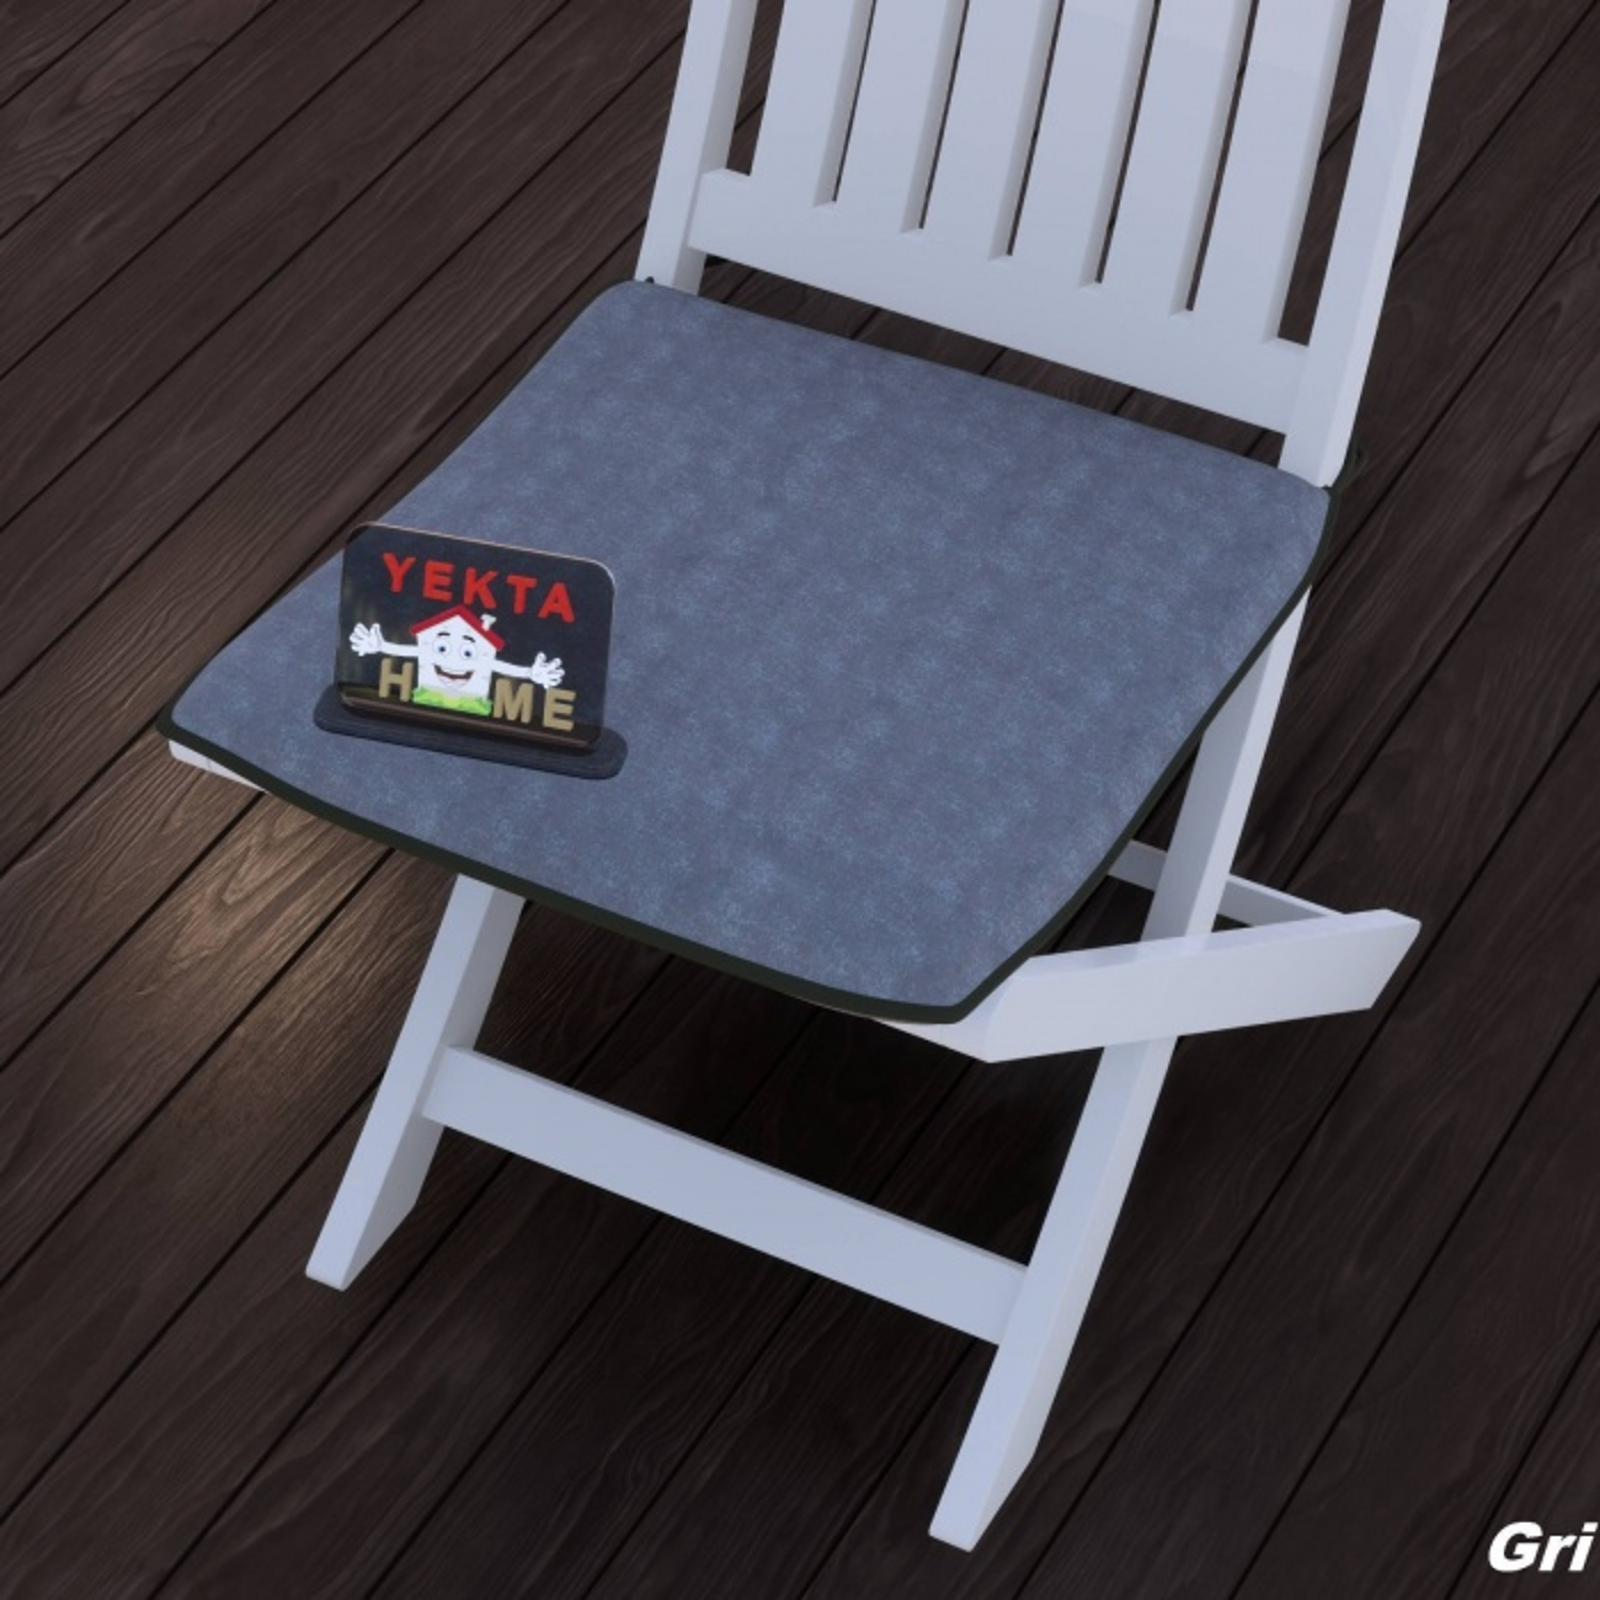 Sandalye Minderi - Rattan Koltuk Minderi 6 Adet Gri